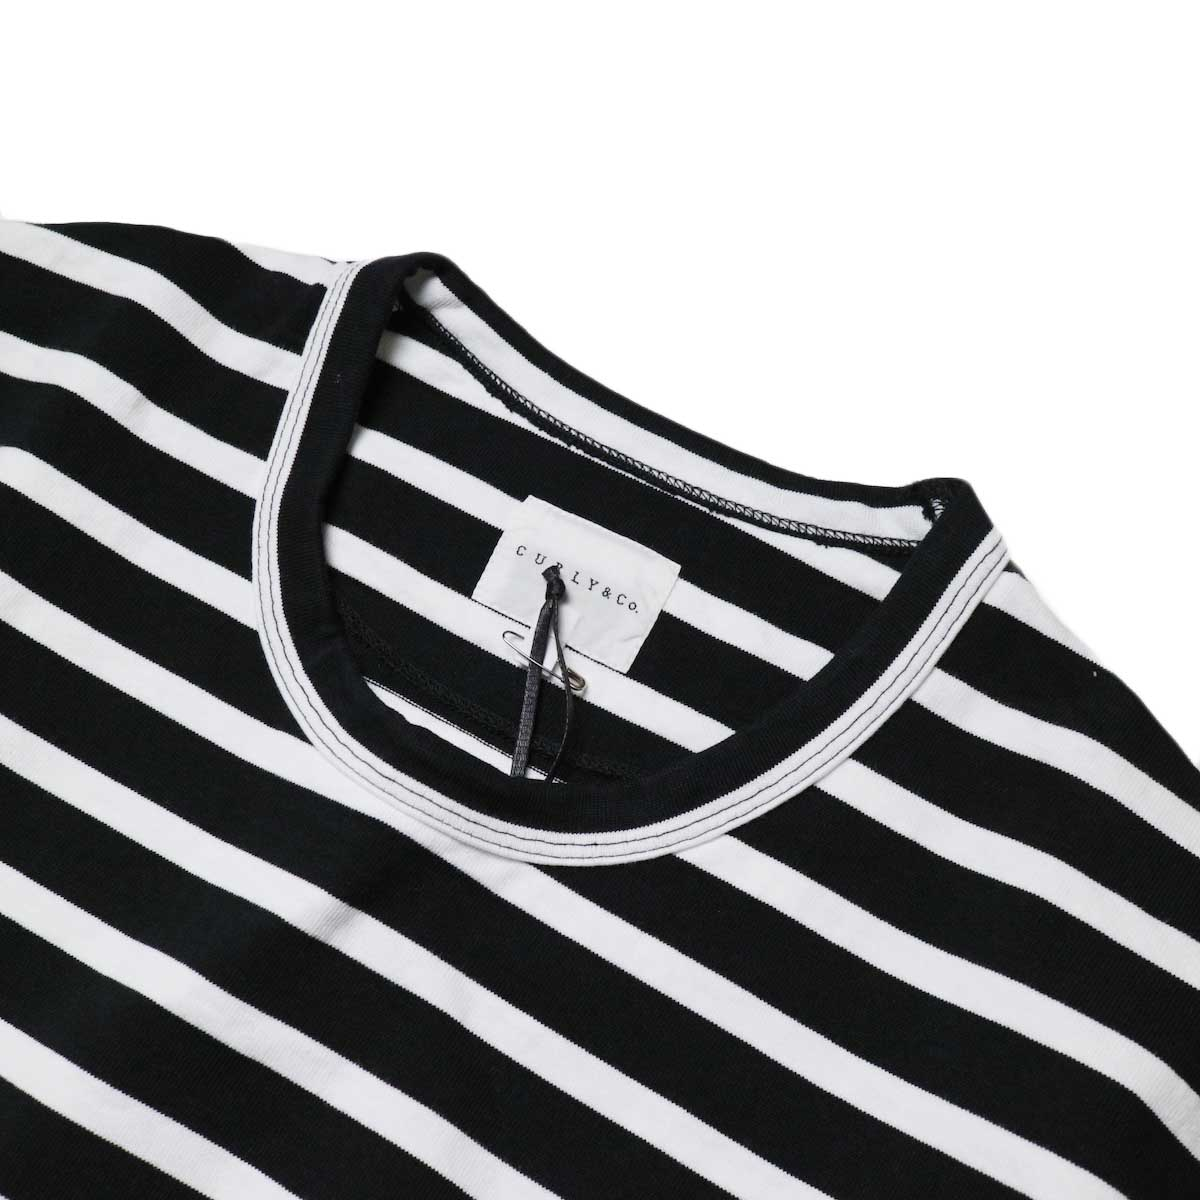 CURLY / SALFORD L/S BORDER TEE (Black / White)襟、バインダーネック